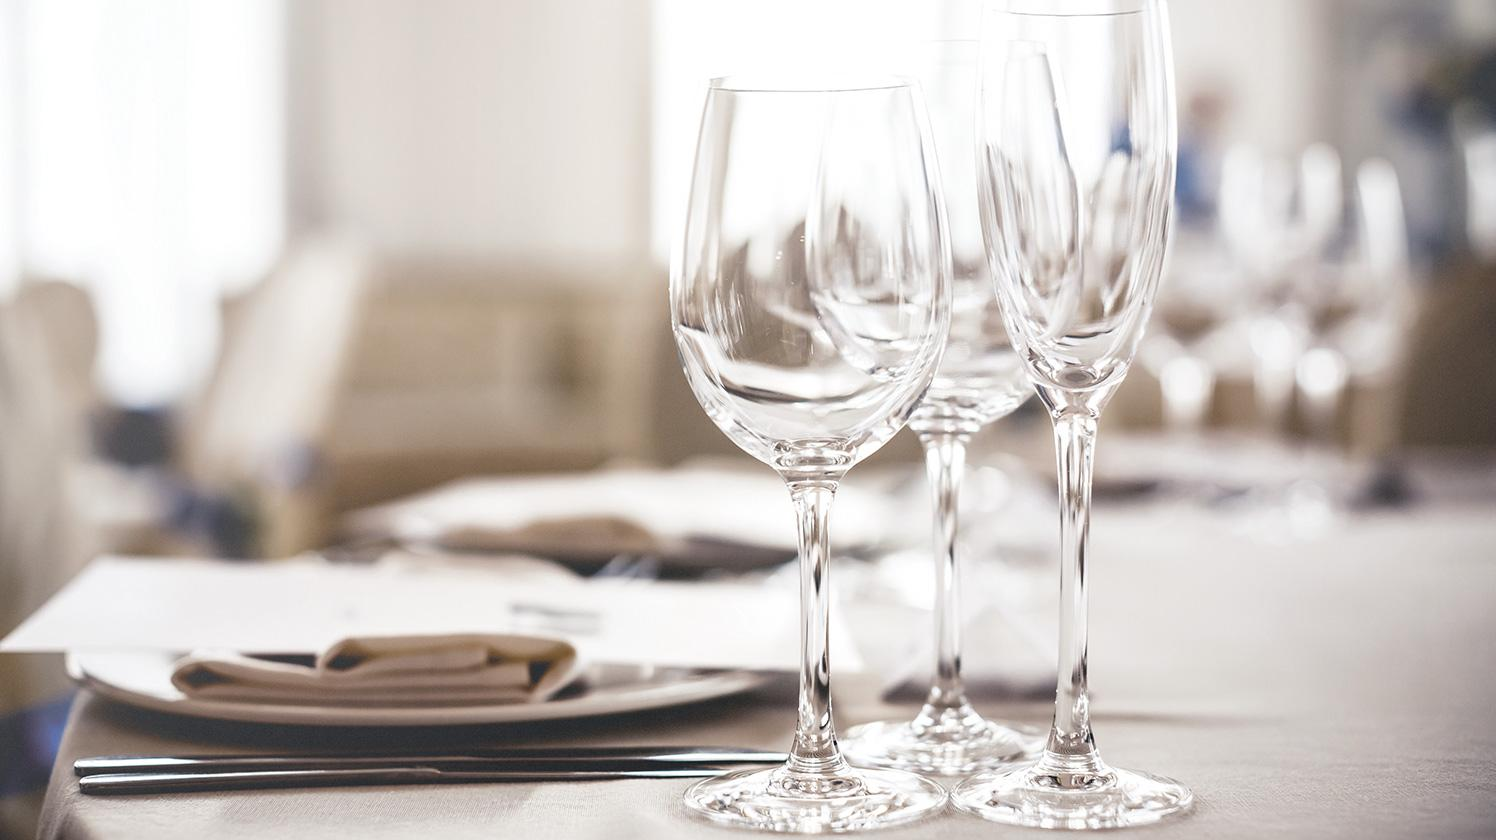 BRITA filter PURITY Clean fine dining restaurant